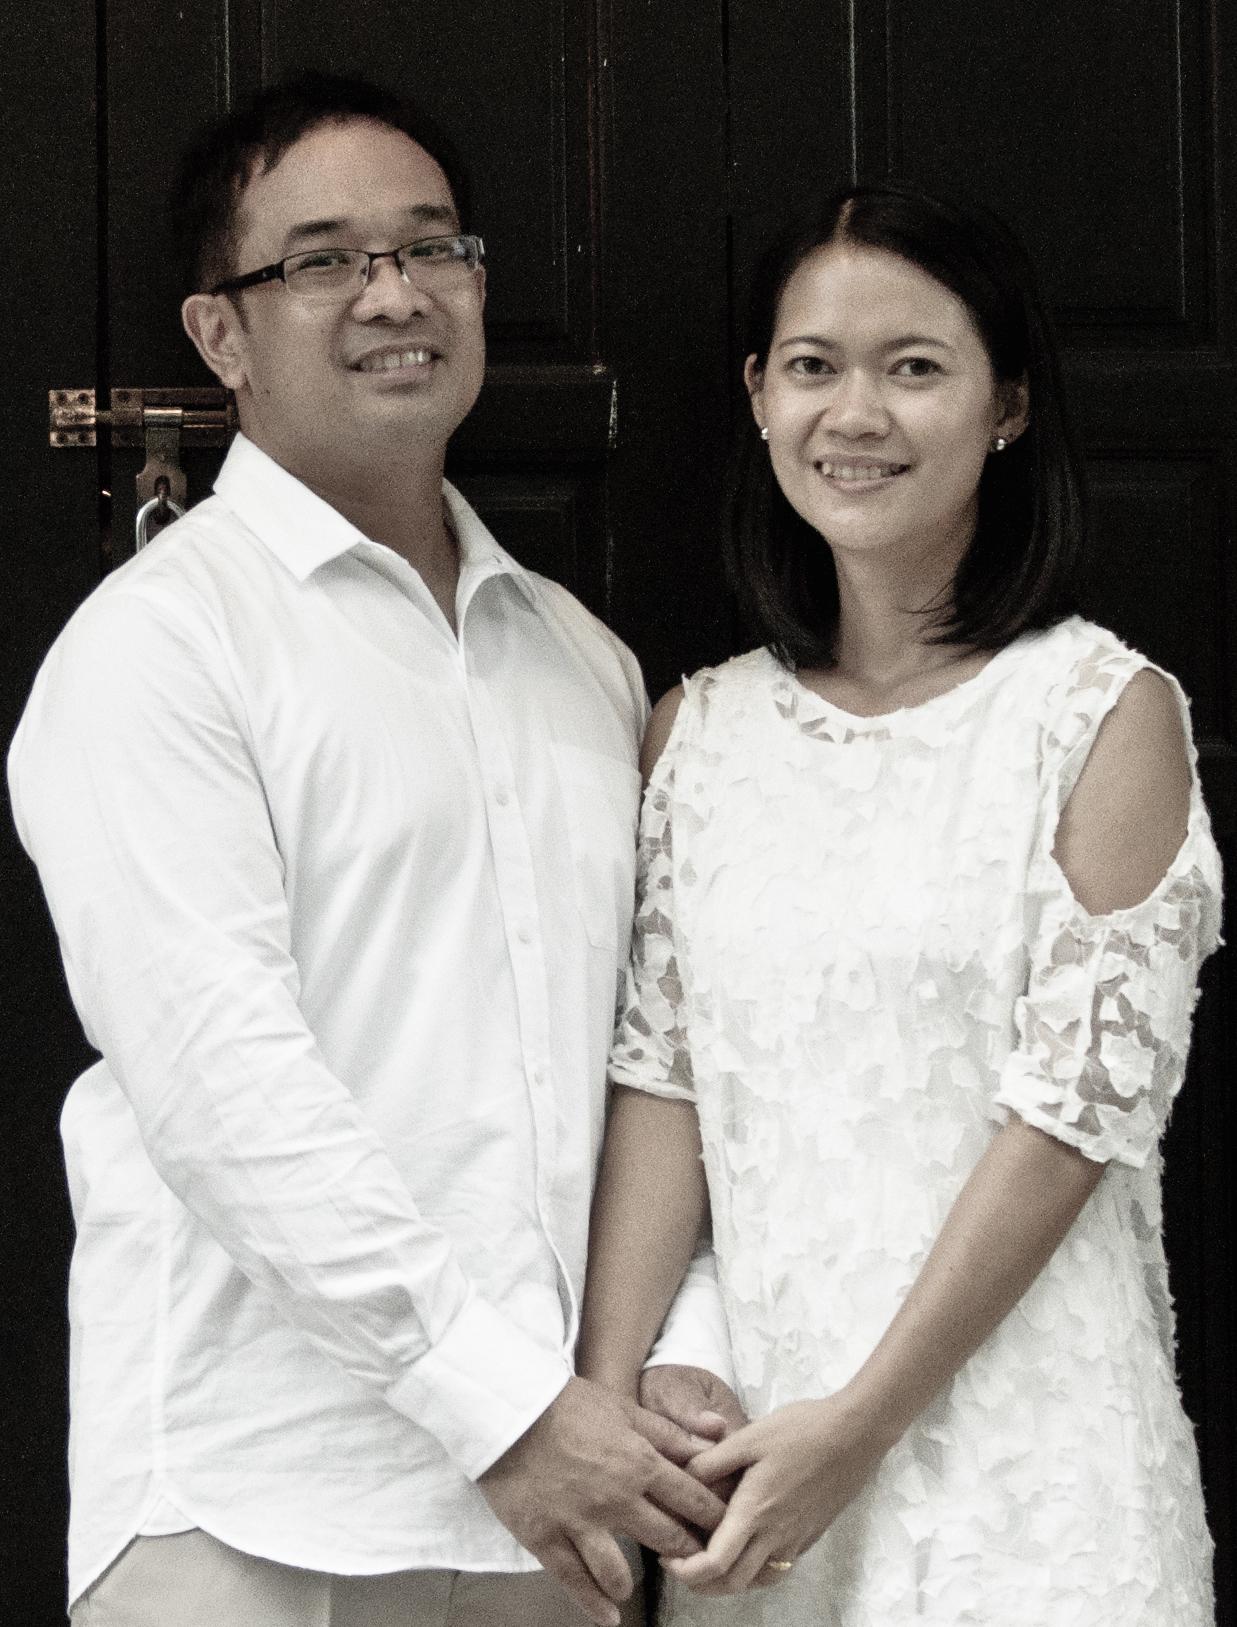 Som & Harry, founders